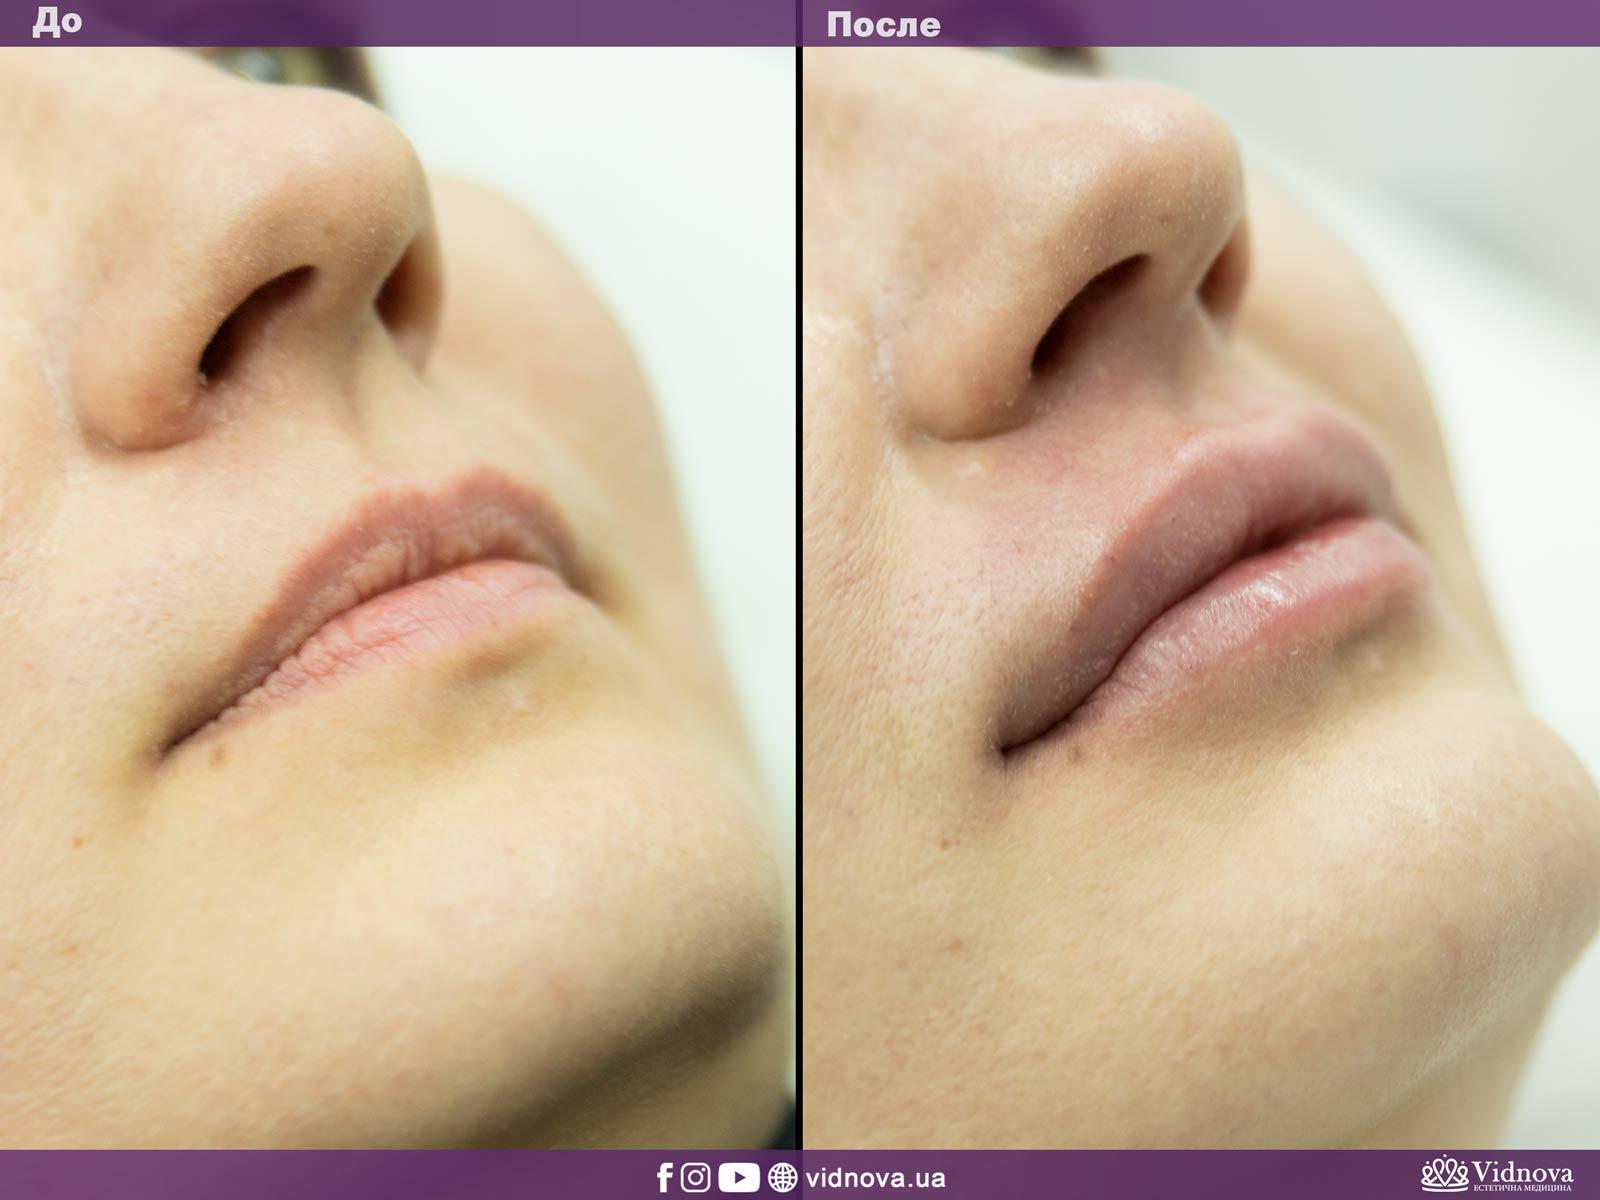 Увеличение губ: Фото До и После - Пример №13-2 - Клиника Vidnova